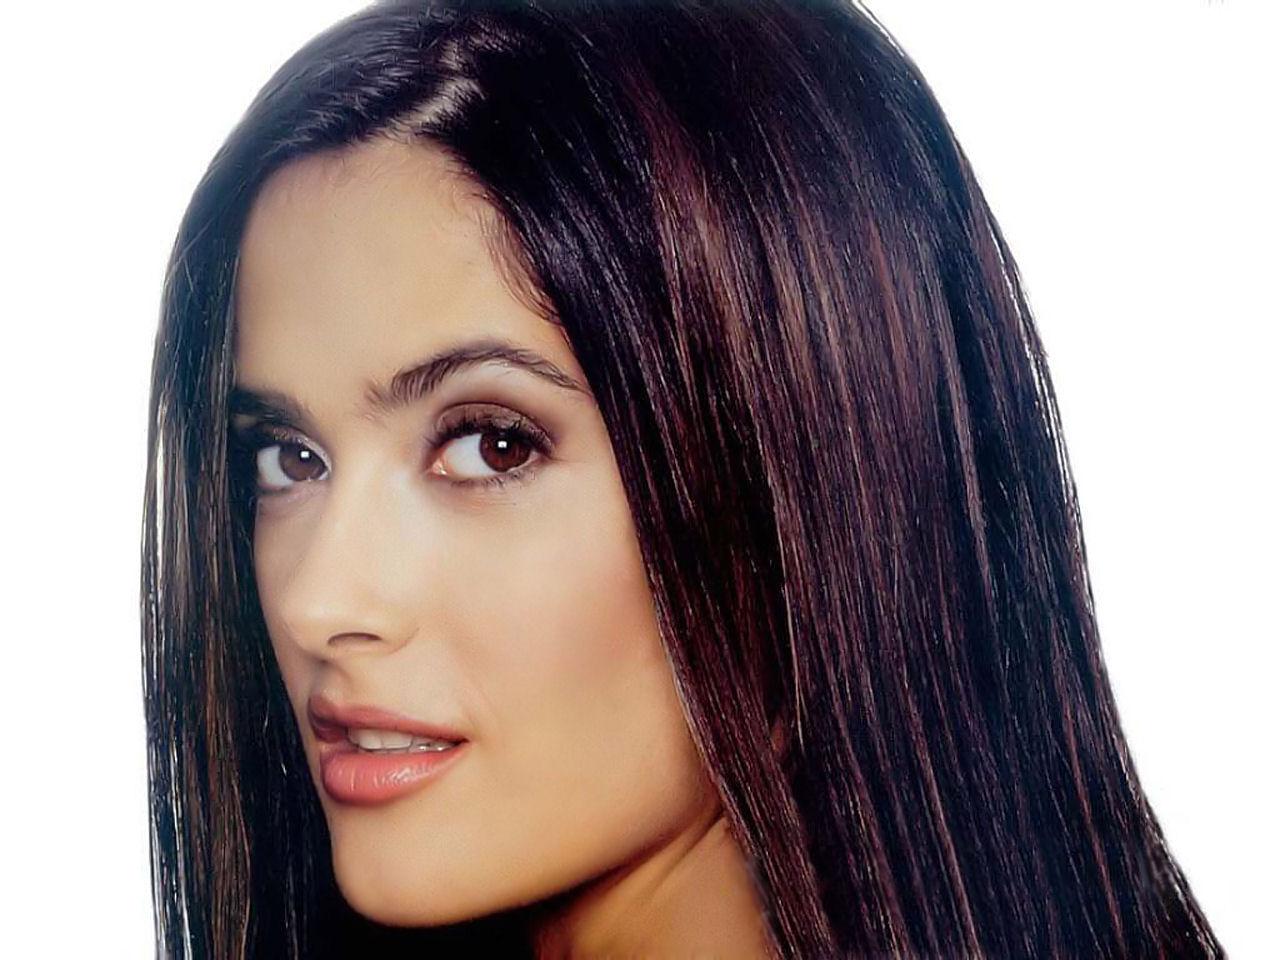 http://4.bp.blogspot.com/-IMwUmn5V9ZM/Tpb7Dh559LI/AAAAAAAAAAU/TMJeZ65I7NA/s1600/Salma+Hayek+hairstyles.jpg